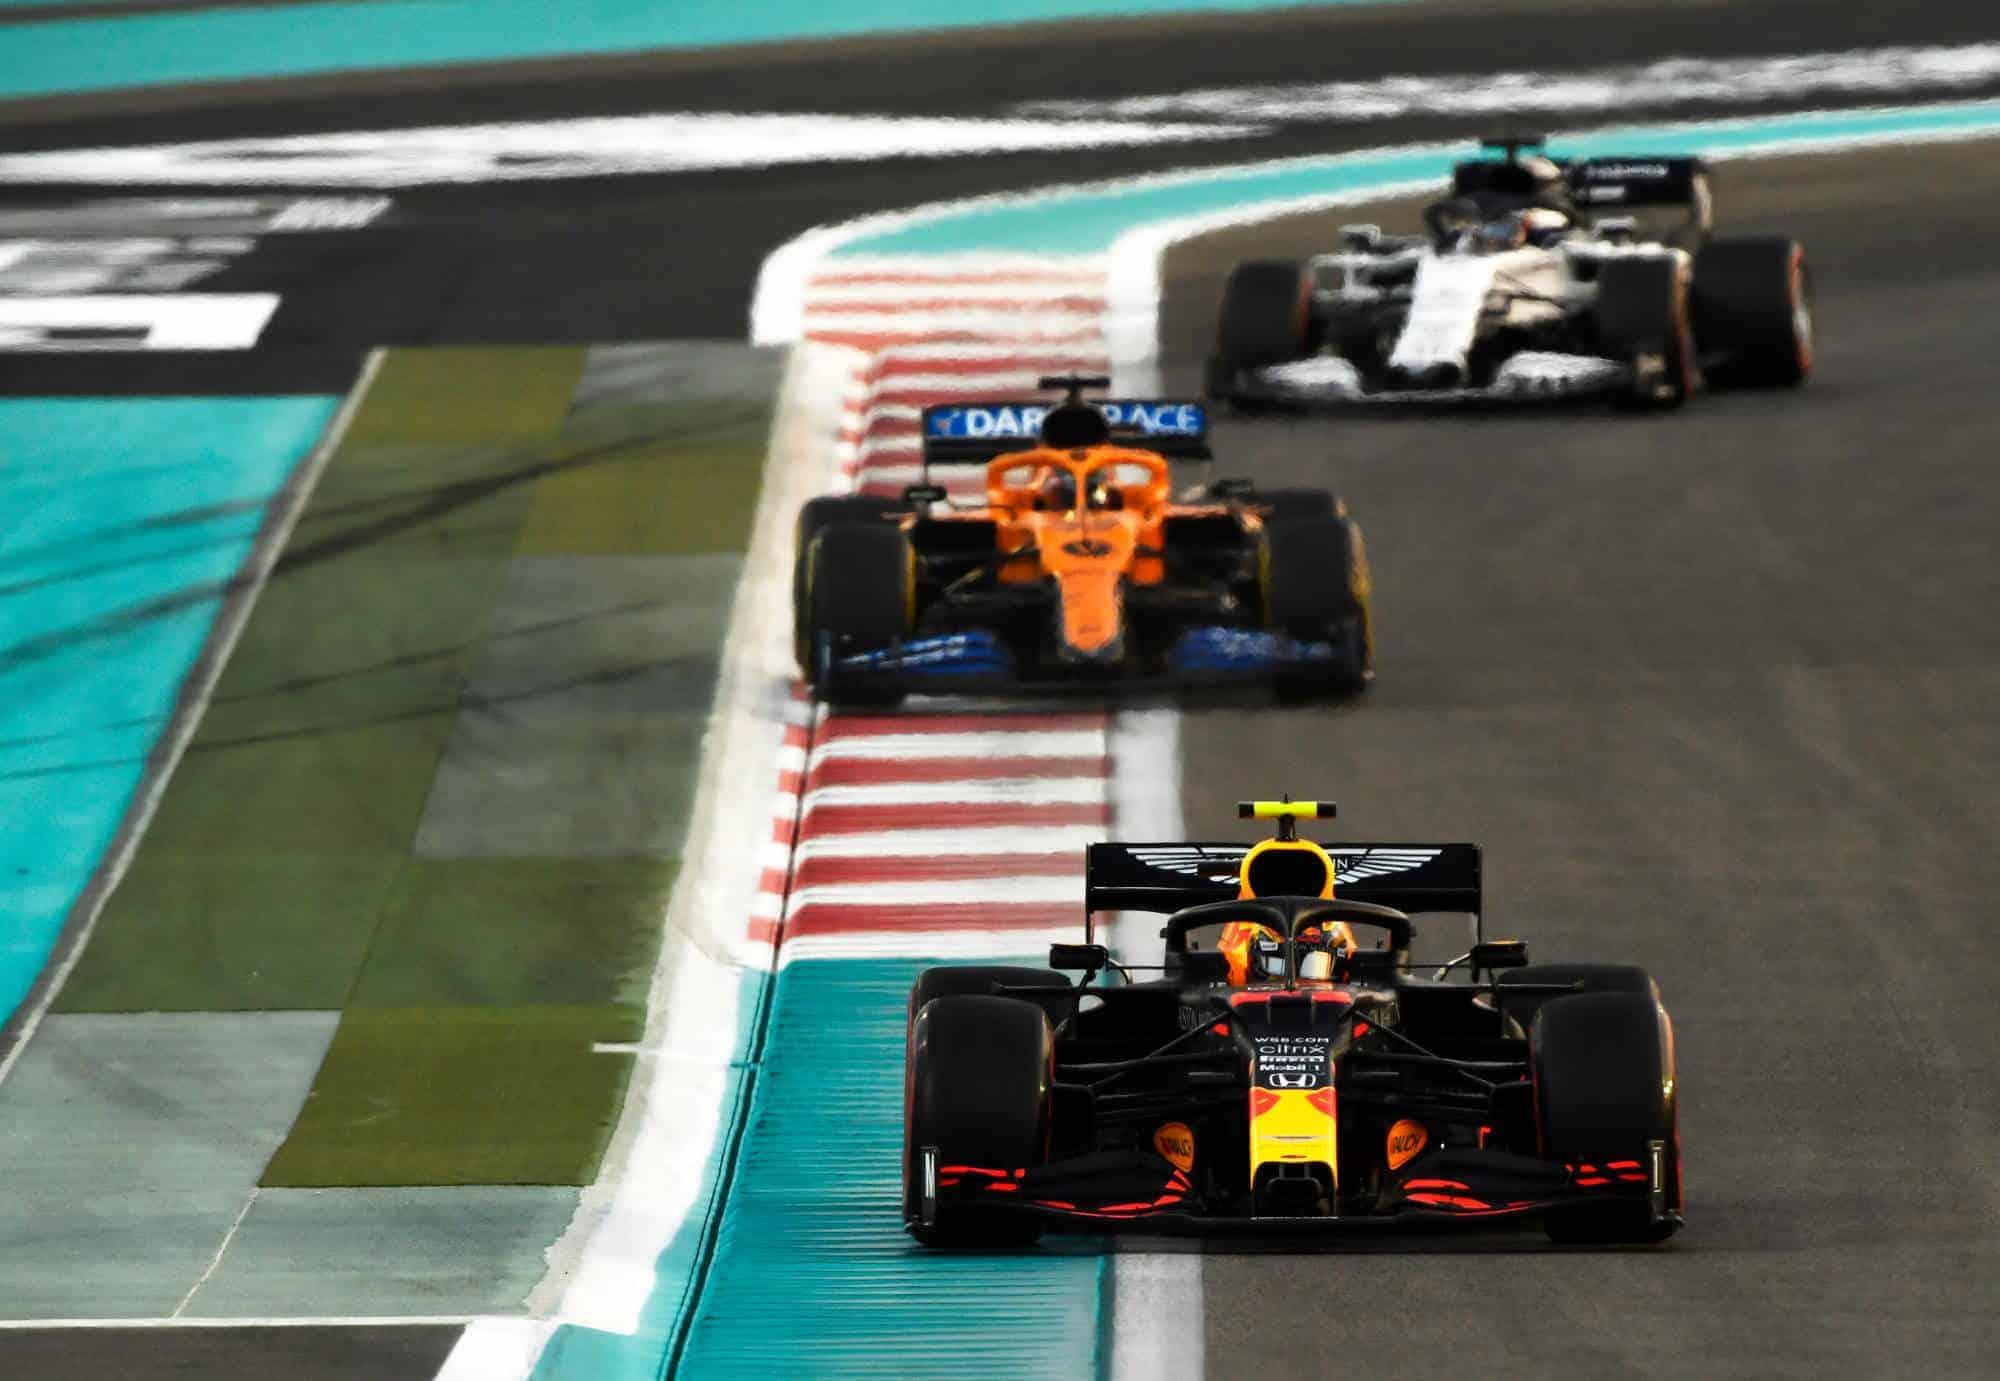 2020 Abu Dhabi GP Albon leads Sainz and Gasly Photo Red Bull